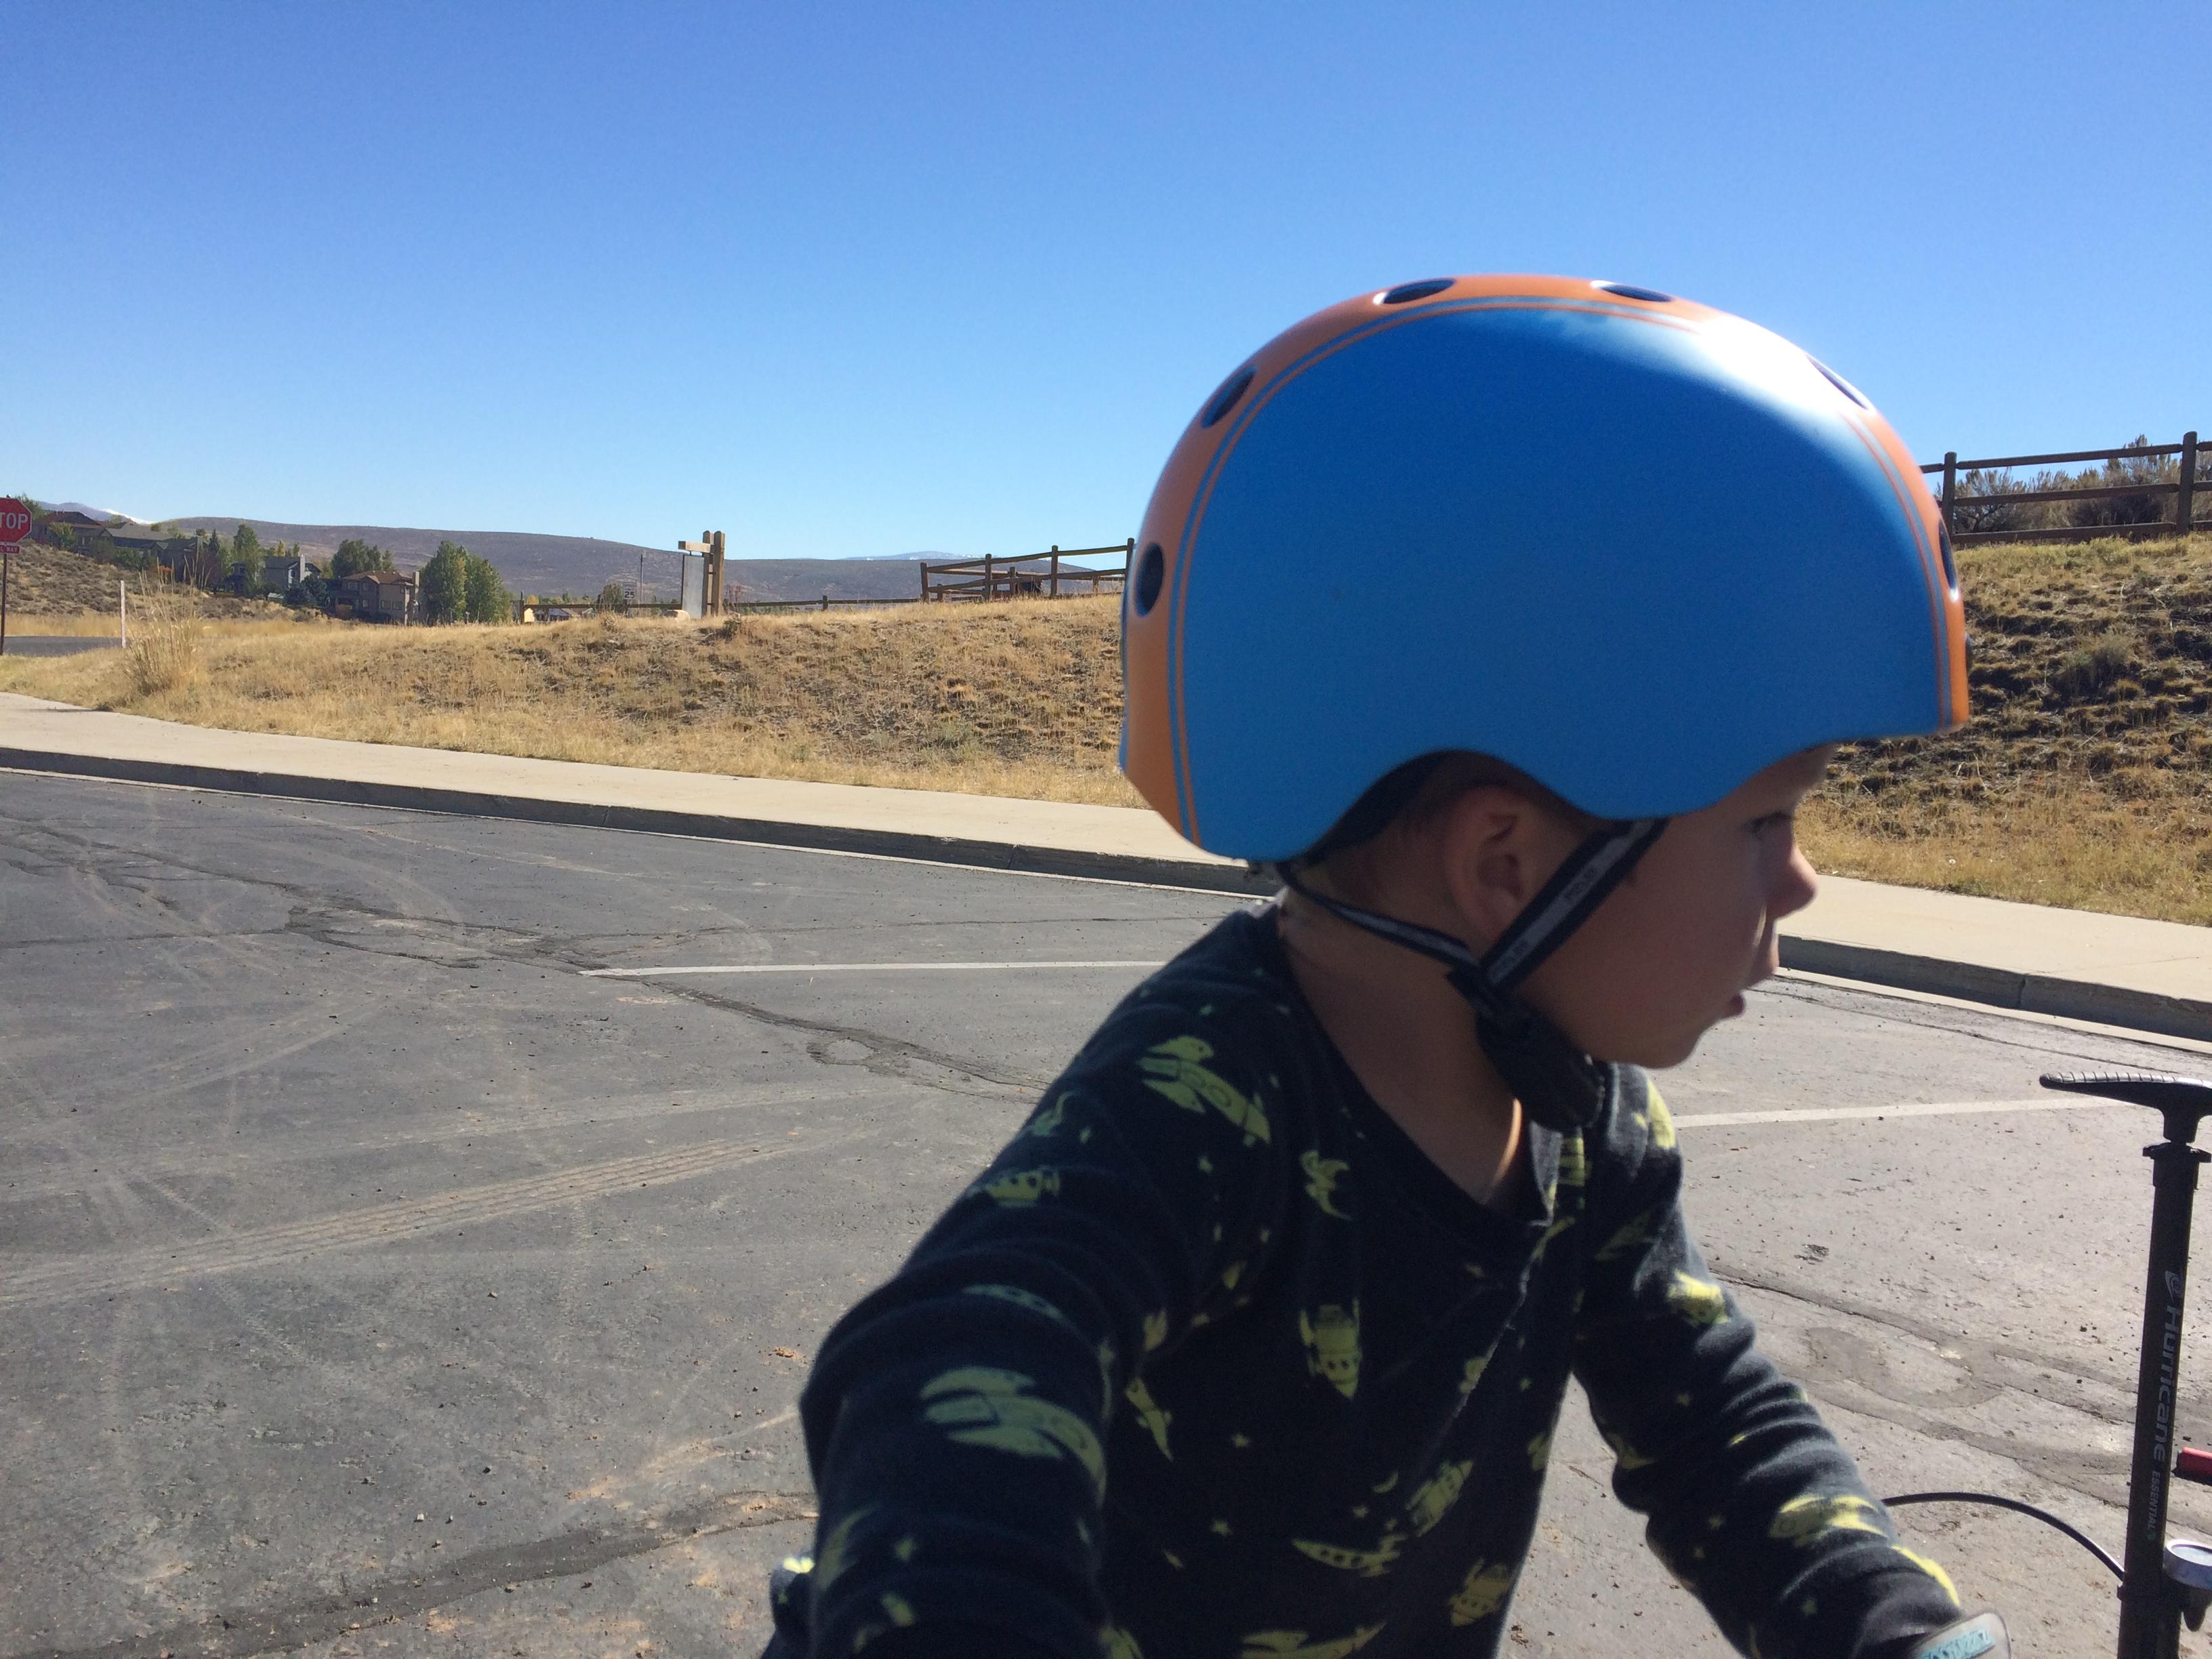 Melon Helmet Review  Fun Skate-Style Helmets for Kids - Rascal Rides c9af38a8654e